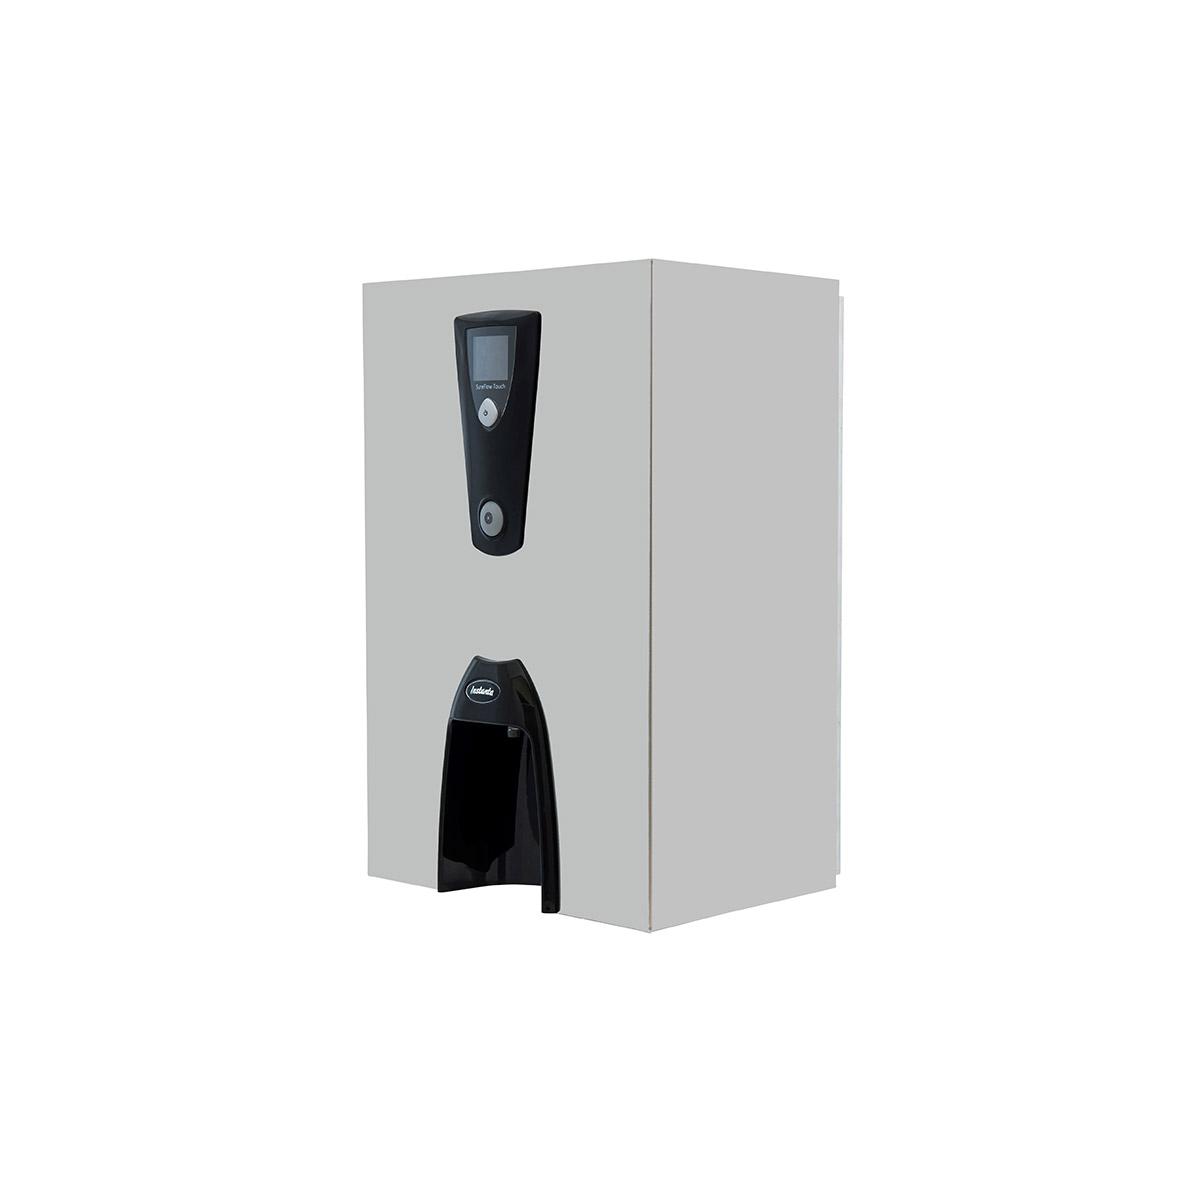 Instanta Sureflow Touch Wall Mounted Water Boiler WMS6PB 6Ltr